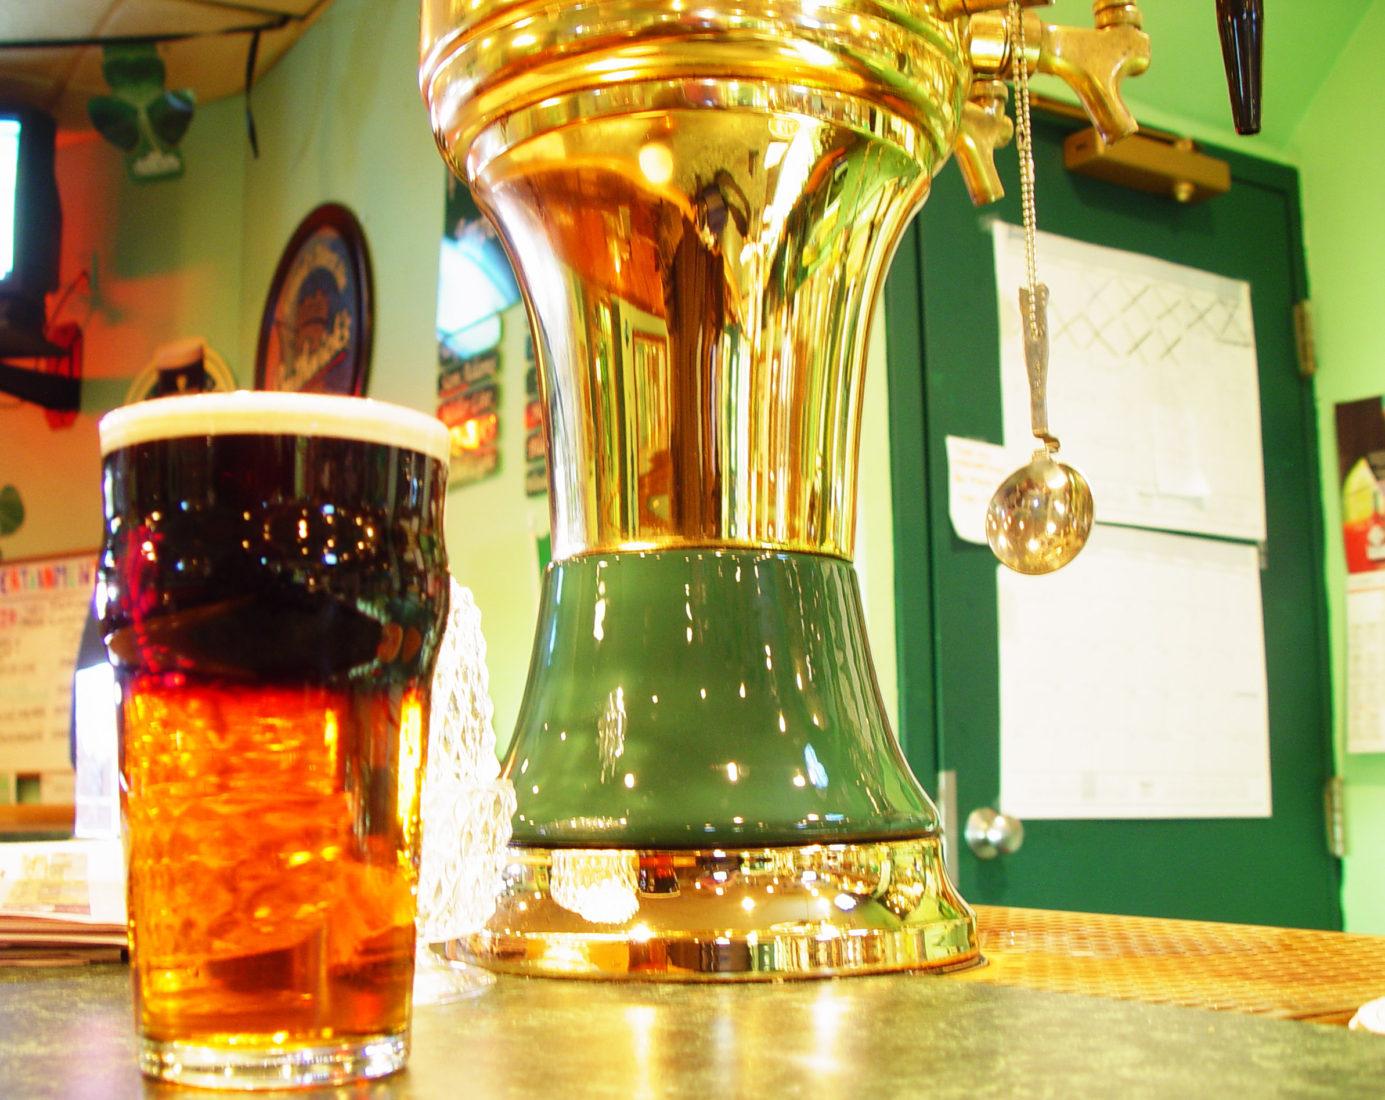 Black and Tan, Annie's Pub, Ardmore PA